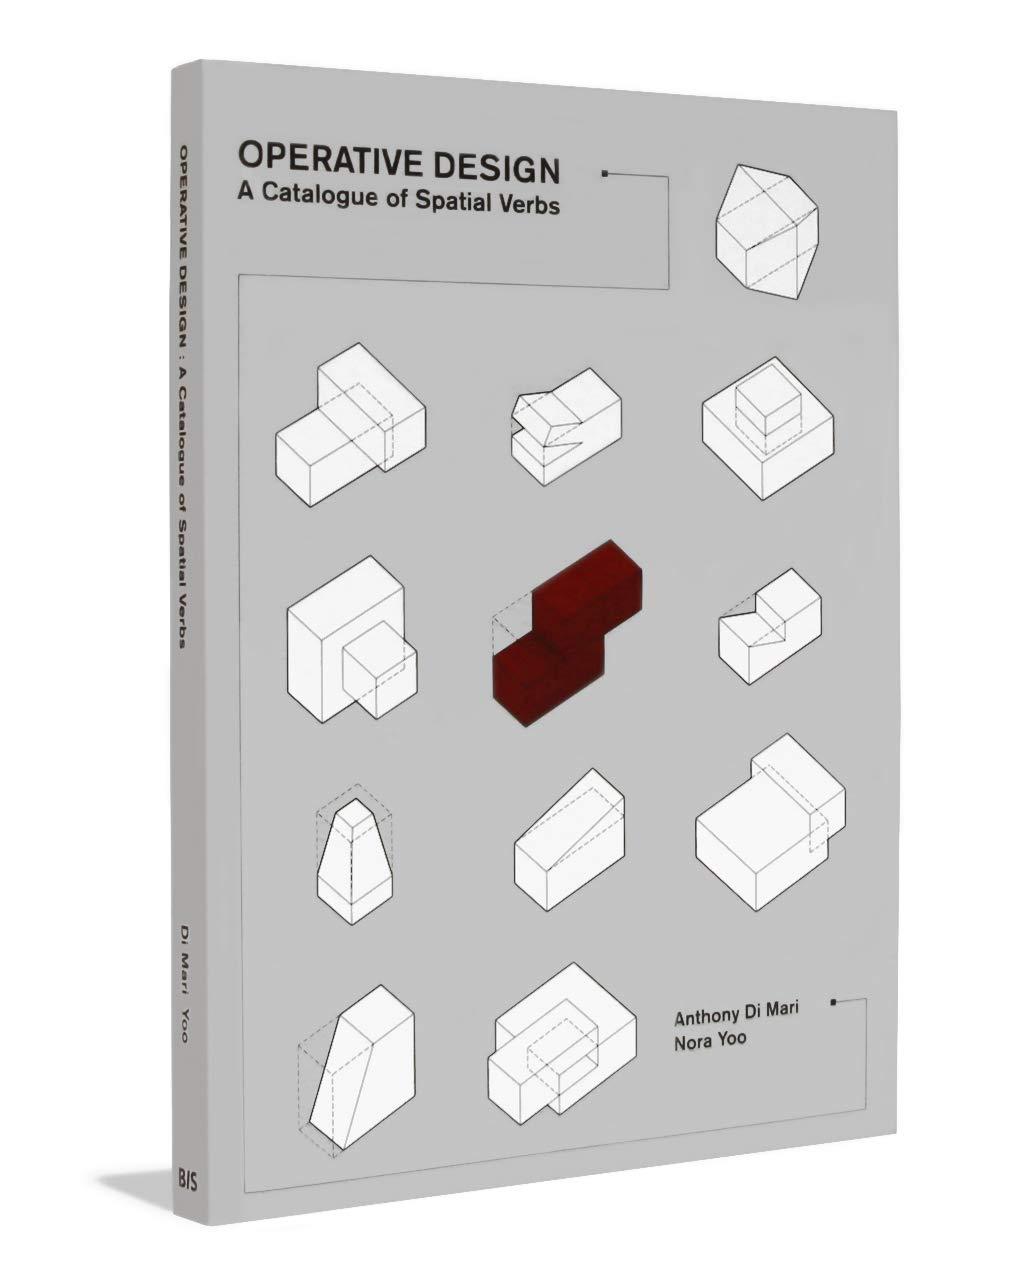 Operative Design A Catalog Of Spatial Verbs Di Mari Anthony 9789063692896 Amazon Com Books